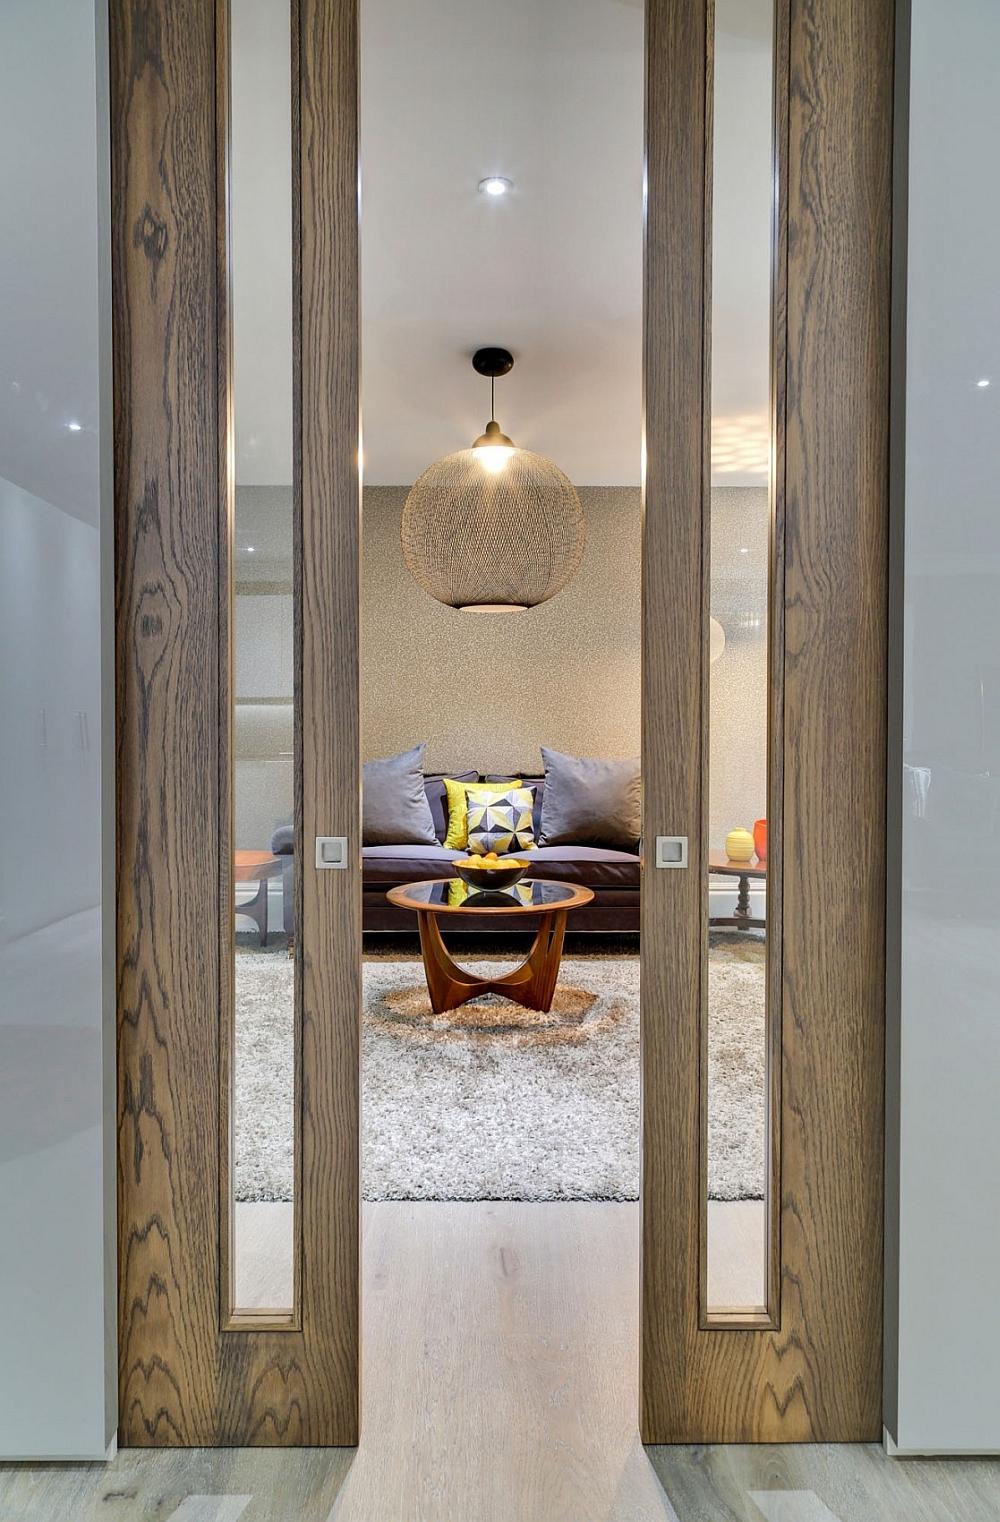 Living room with brilliant globe pendant and sliding wooden framed doors